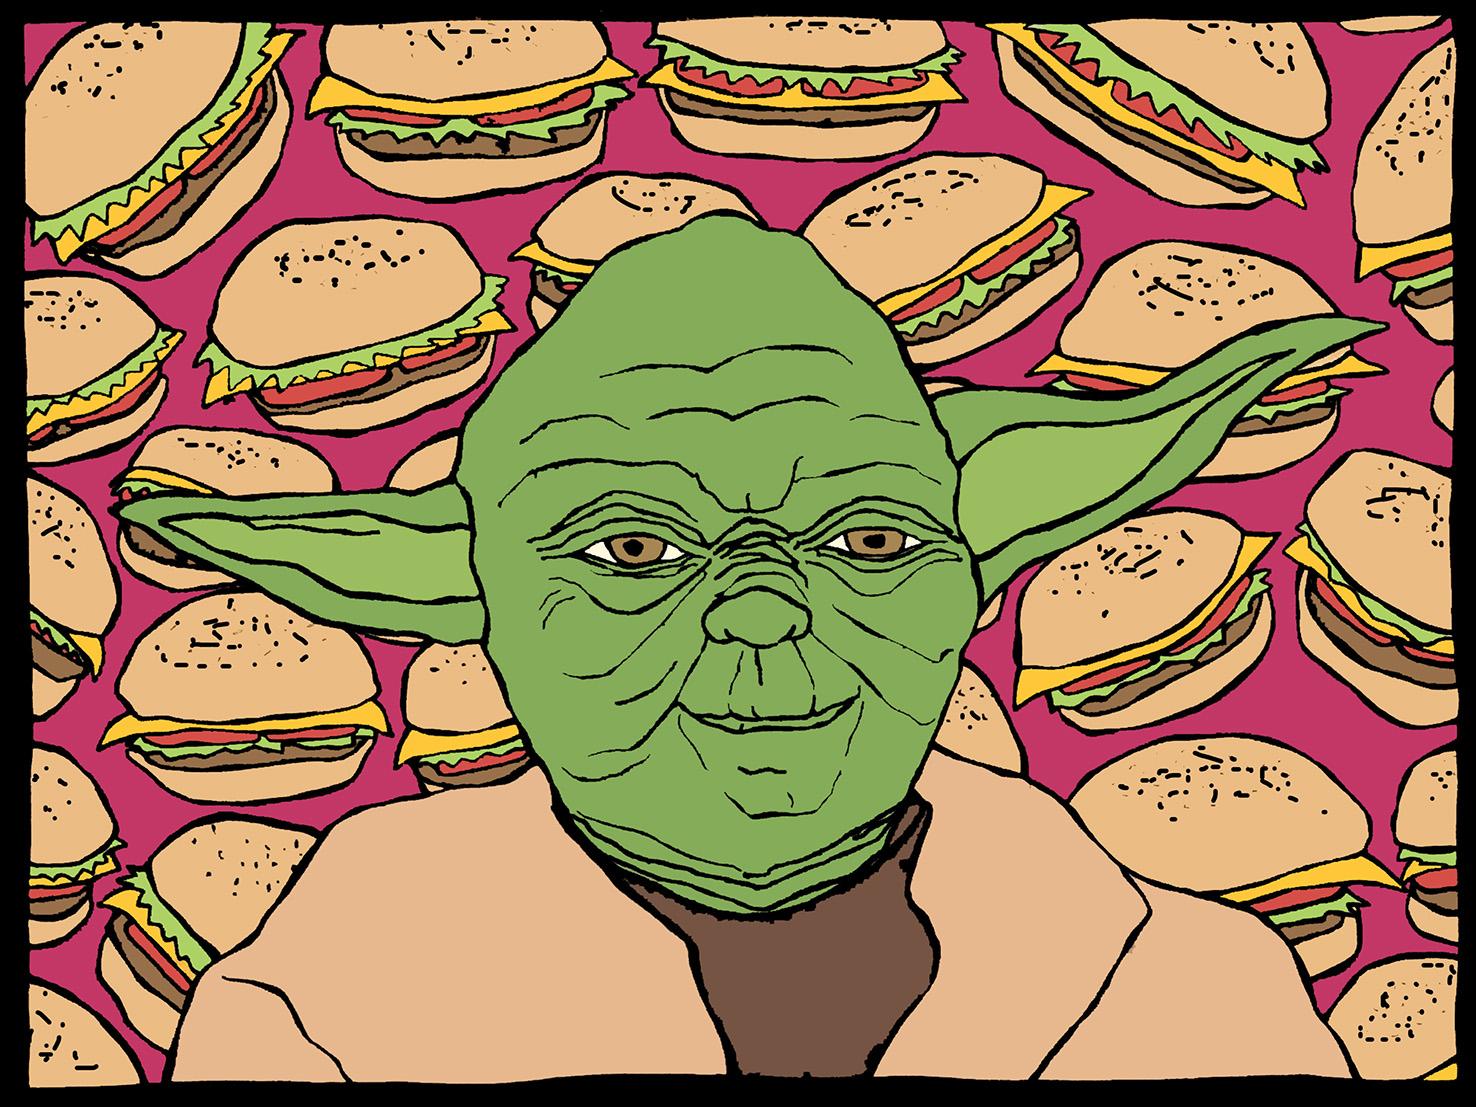 Yoda + cheeseburgers